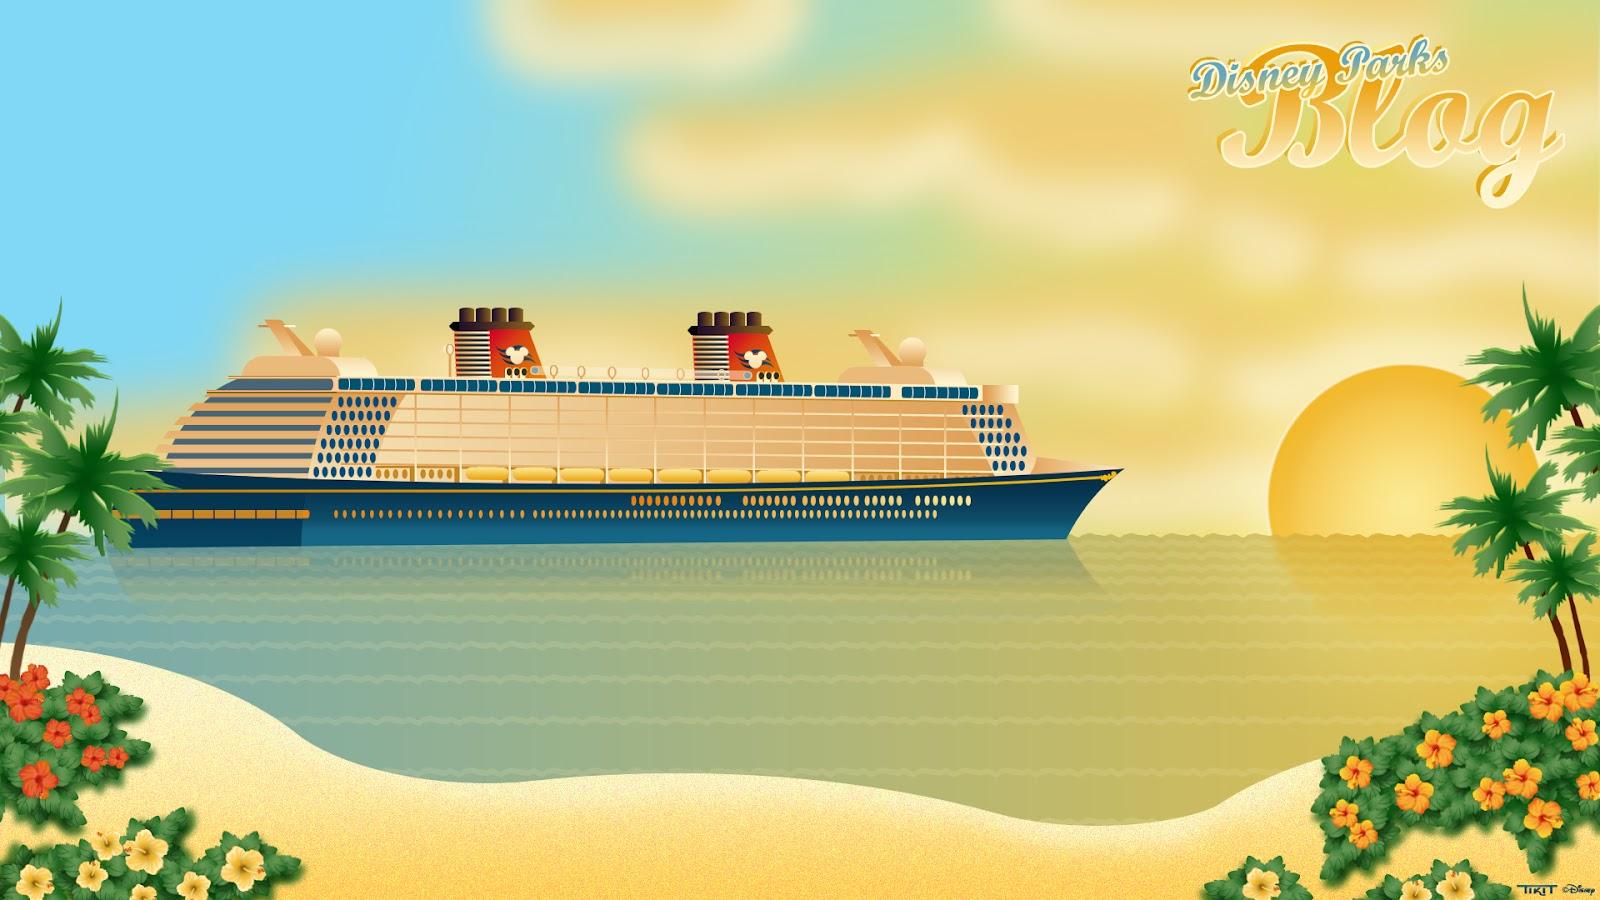 Tiki Tackett Disney Fantasy Wallpaper on the Disney Parks Blog 1600x900